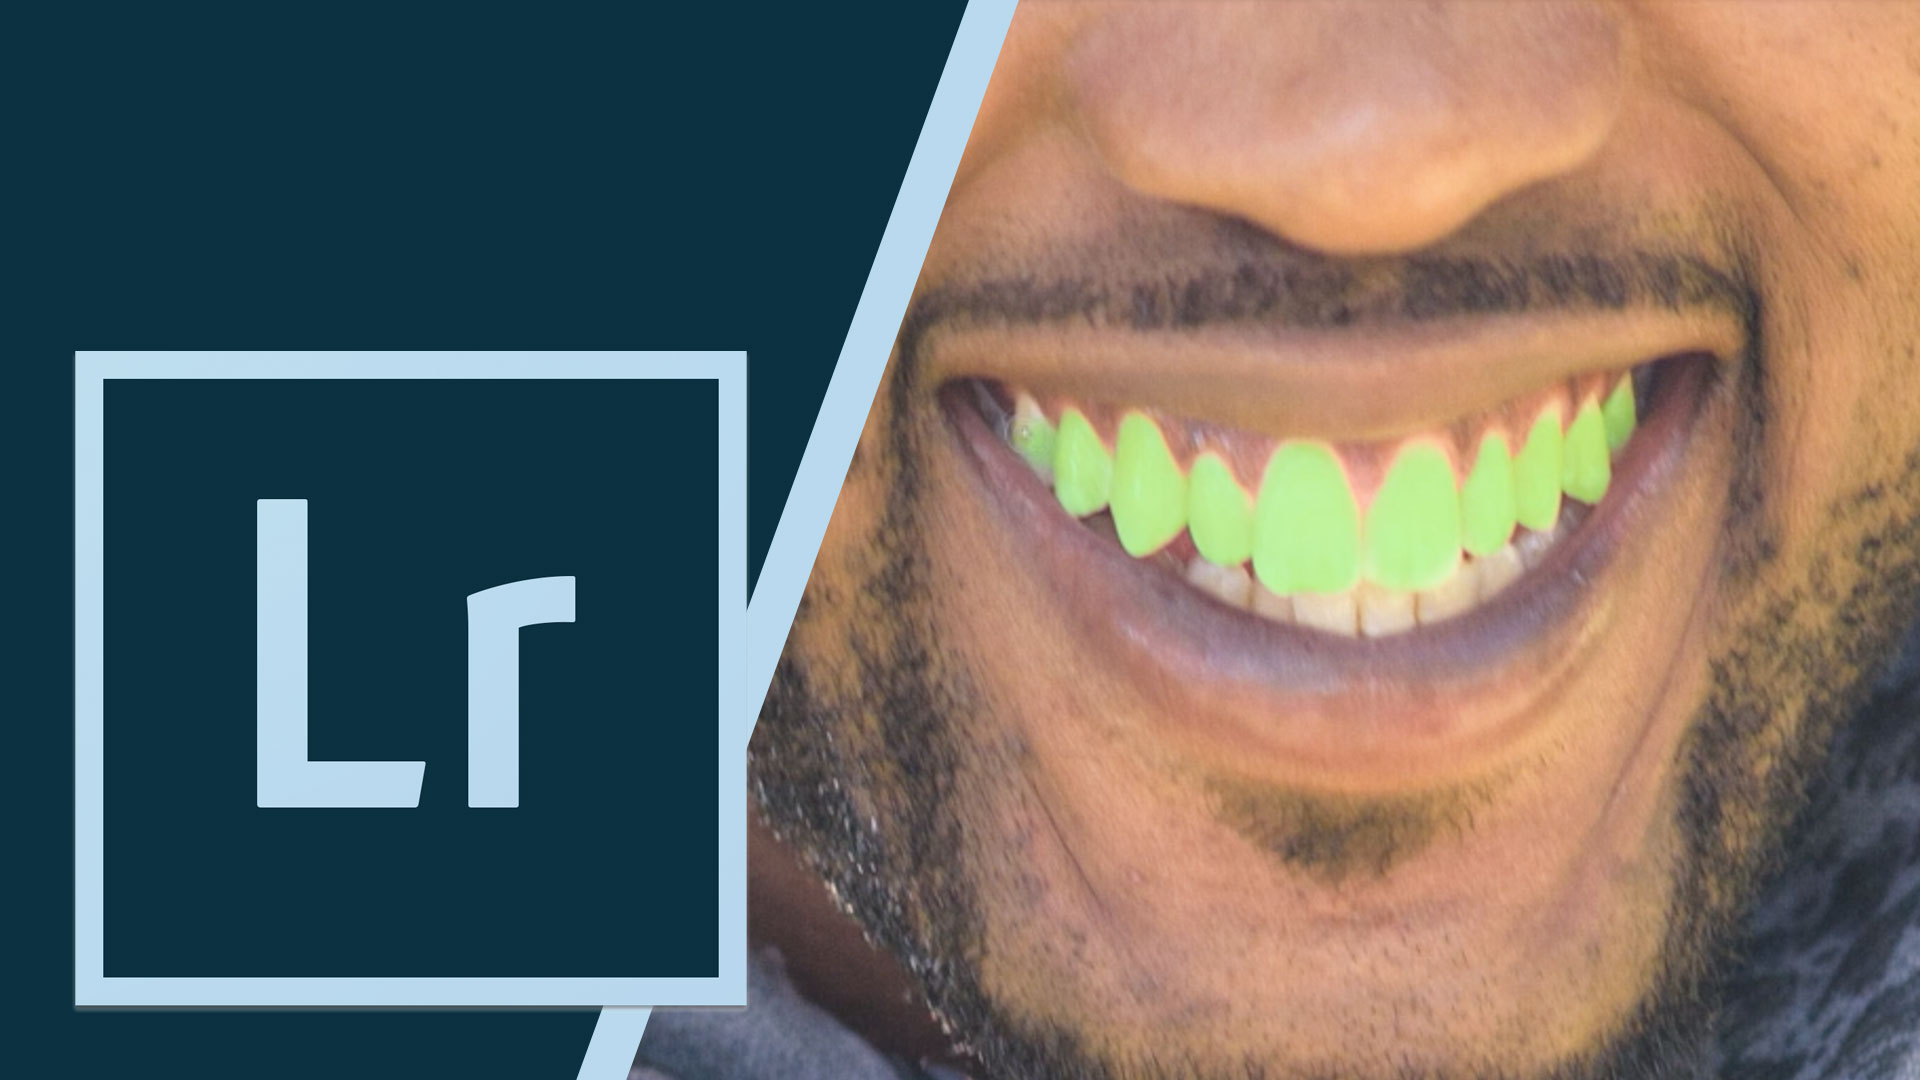 Lightroom Classic CC: How do I whiten teeth?